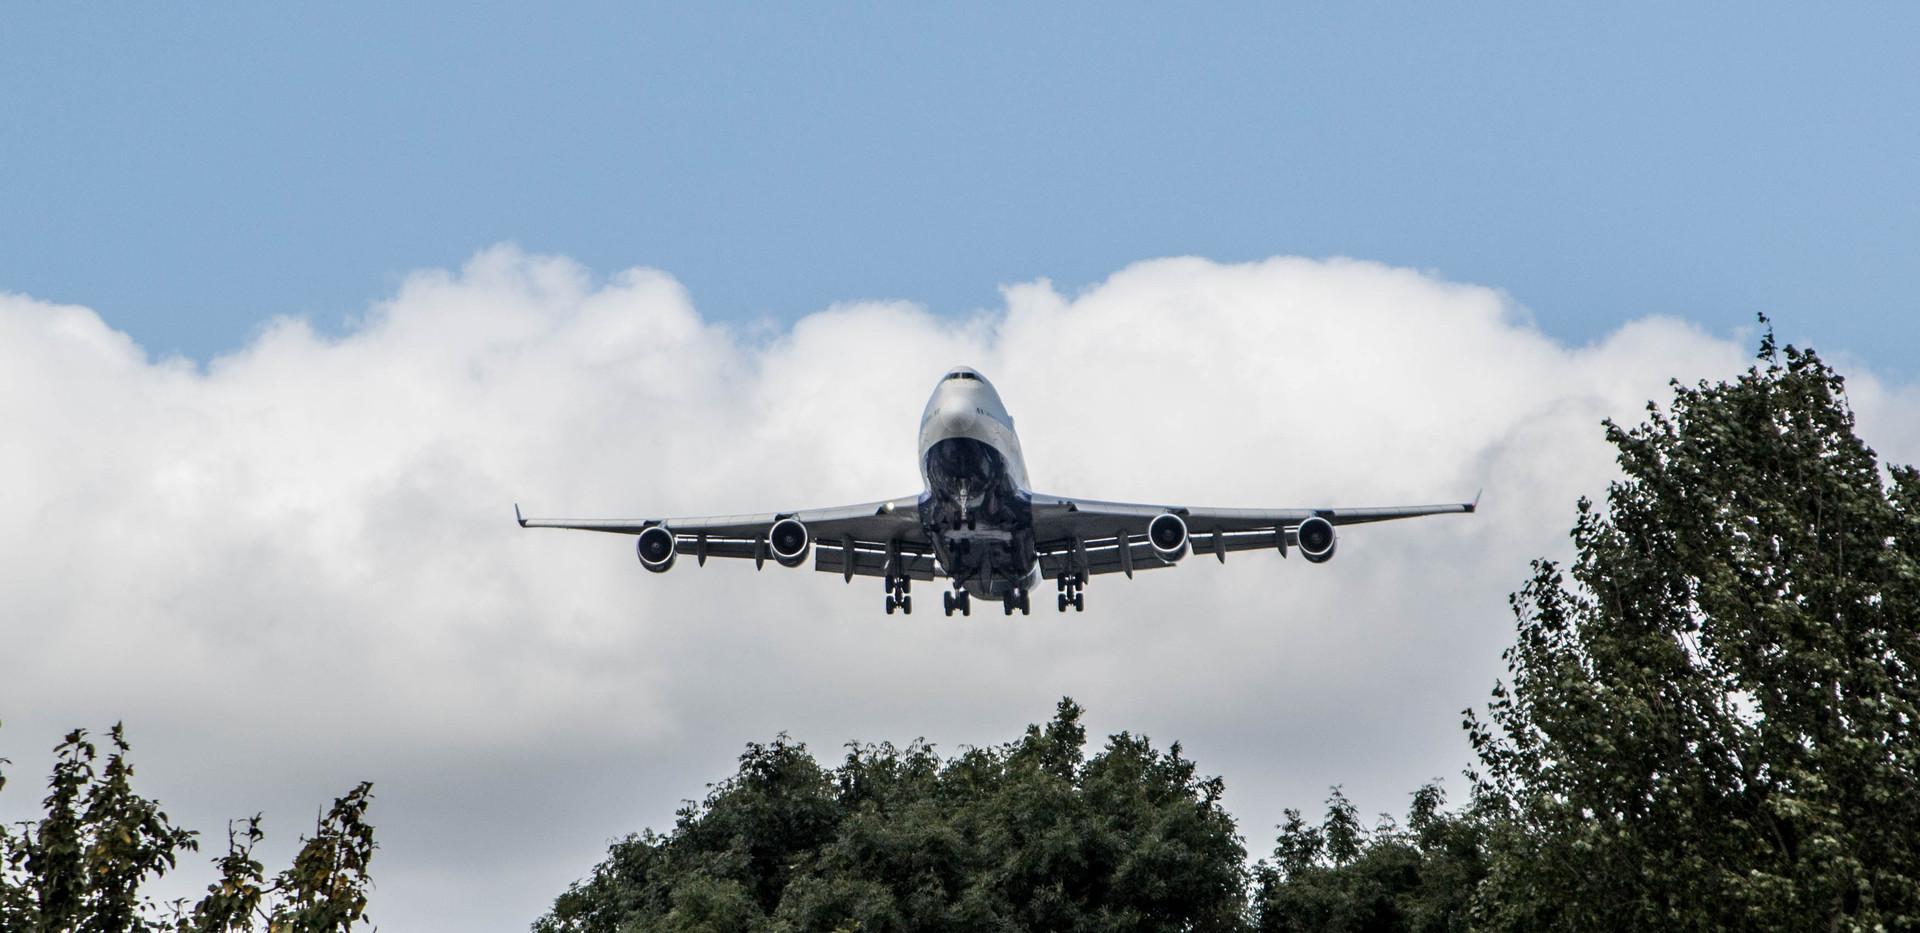 747-trees-1-of-1_37503595016_o.jpg